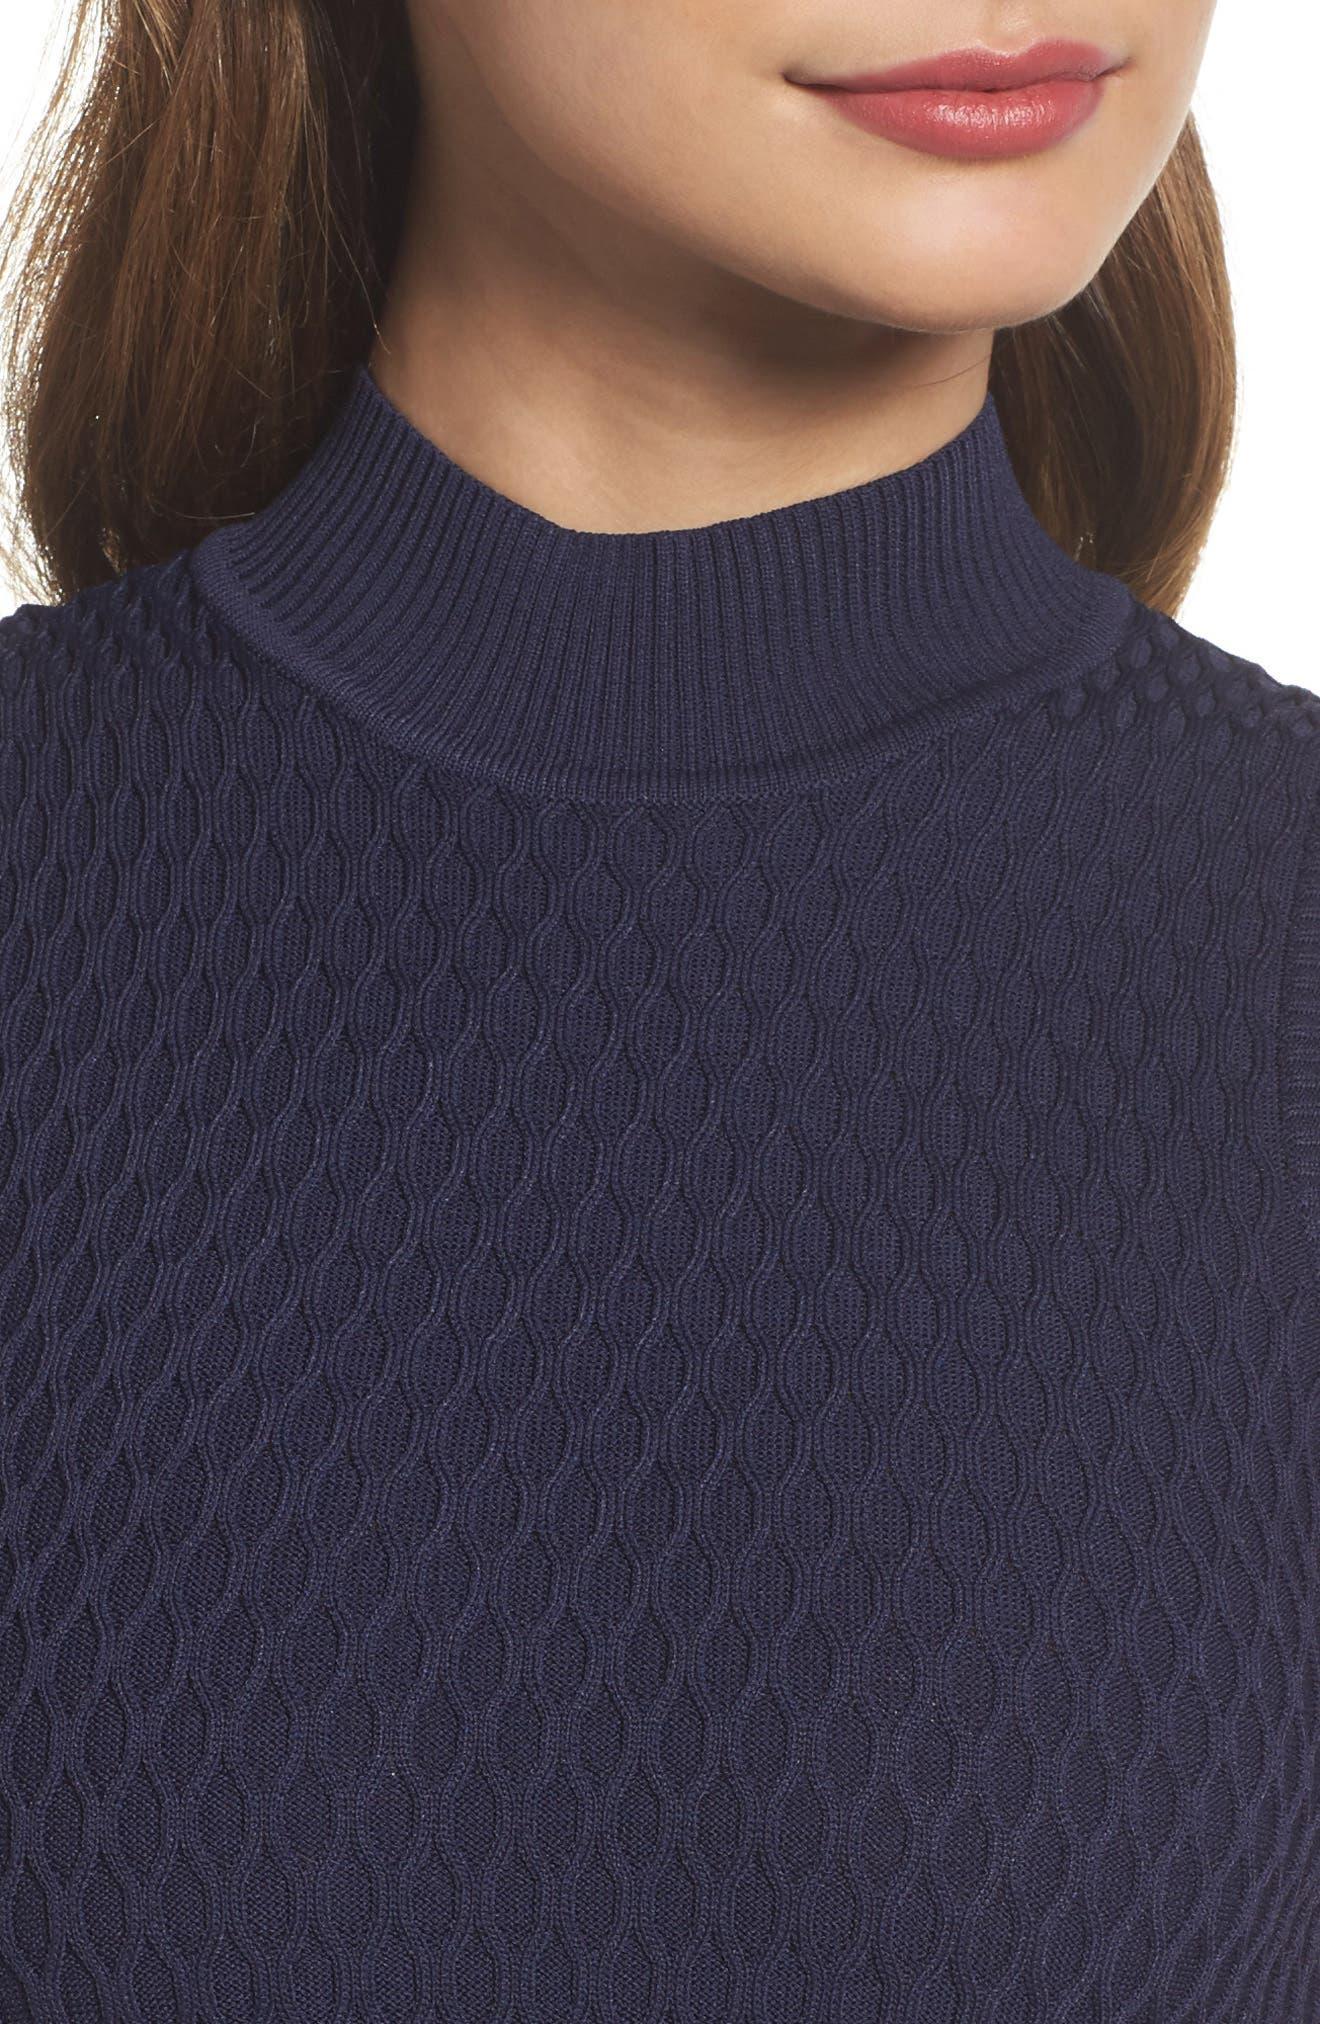 Alternate Image 4  - Adelyn Rae Mock Neck Sweater Dress